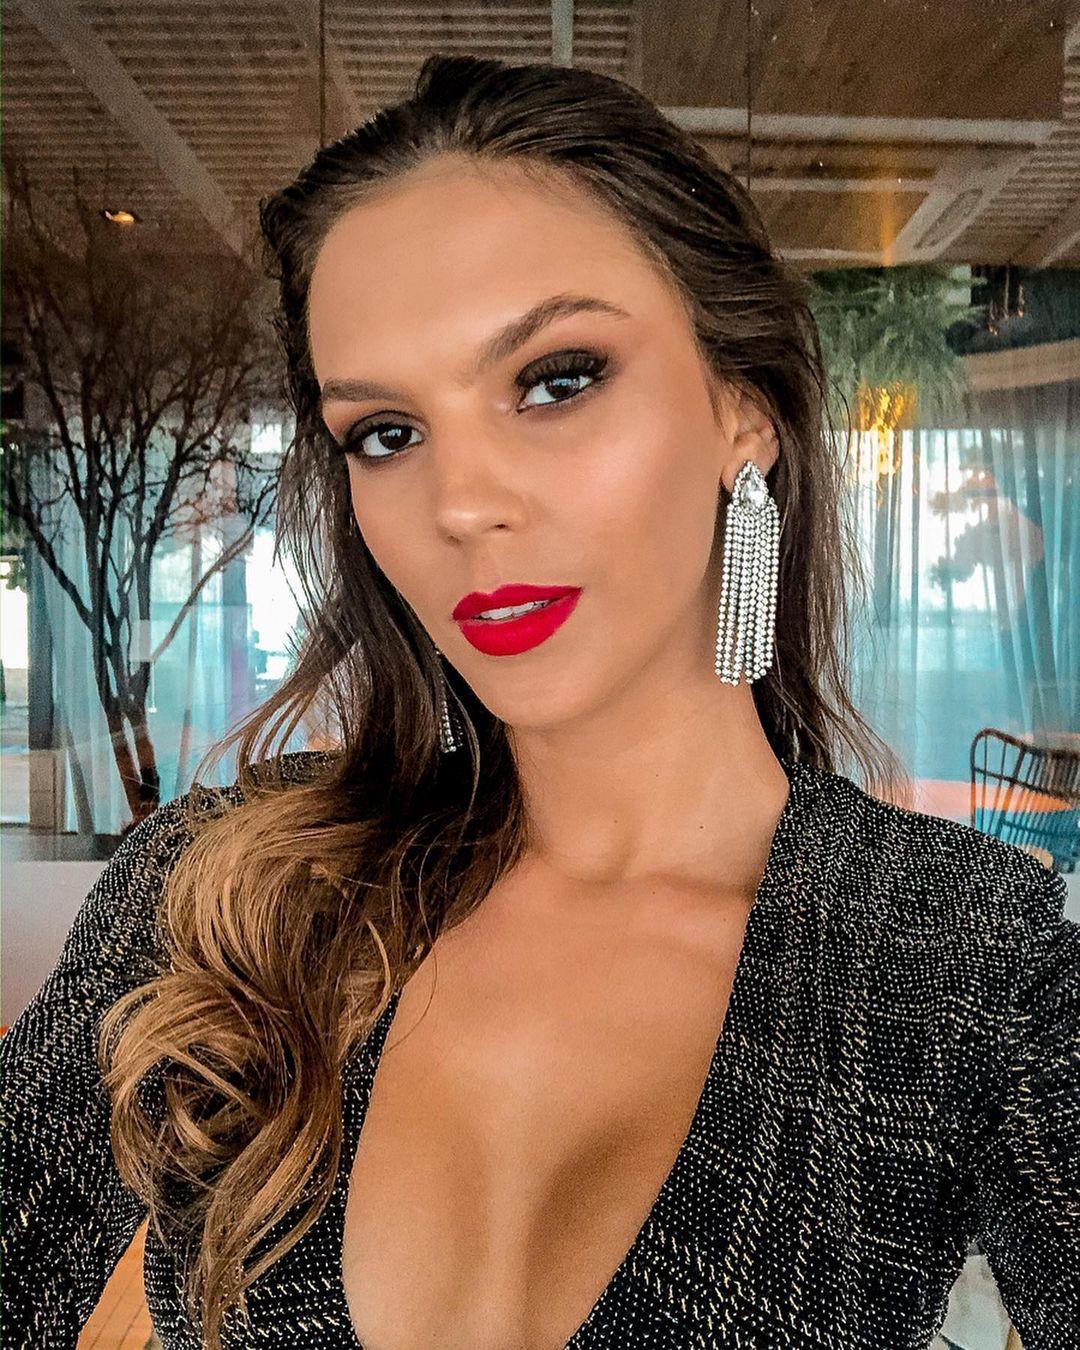 ana flavia giacomini, miss ilha dos lobos mundo 2019. - Página 5 Fwwcuv10